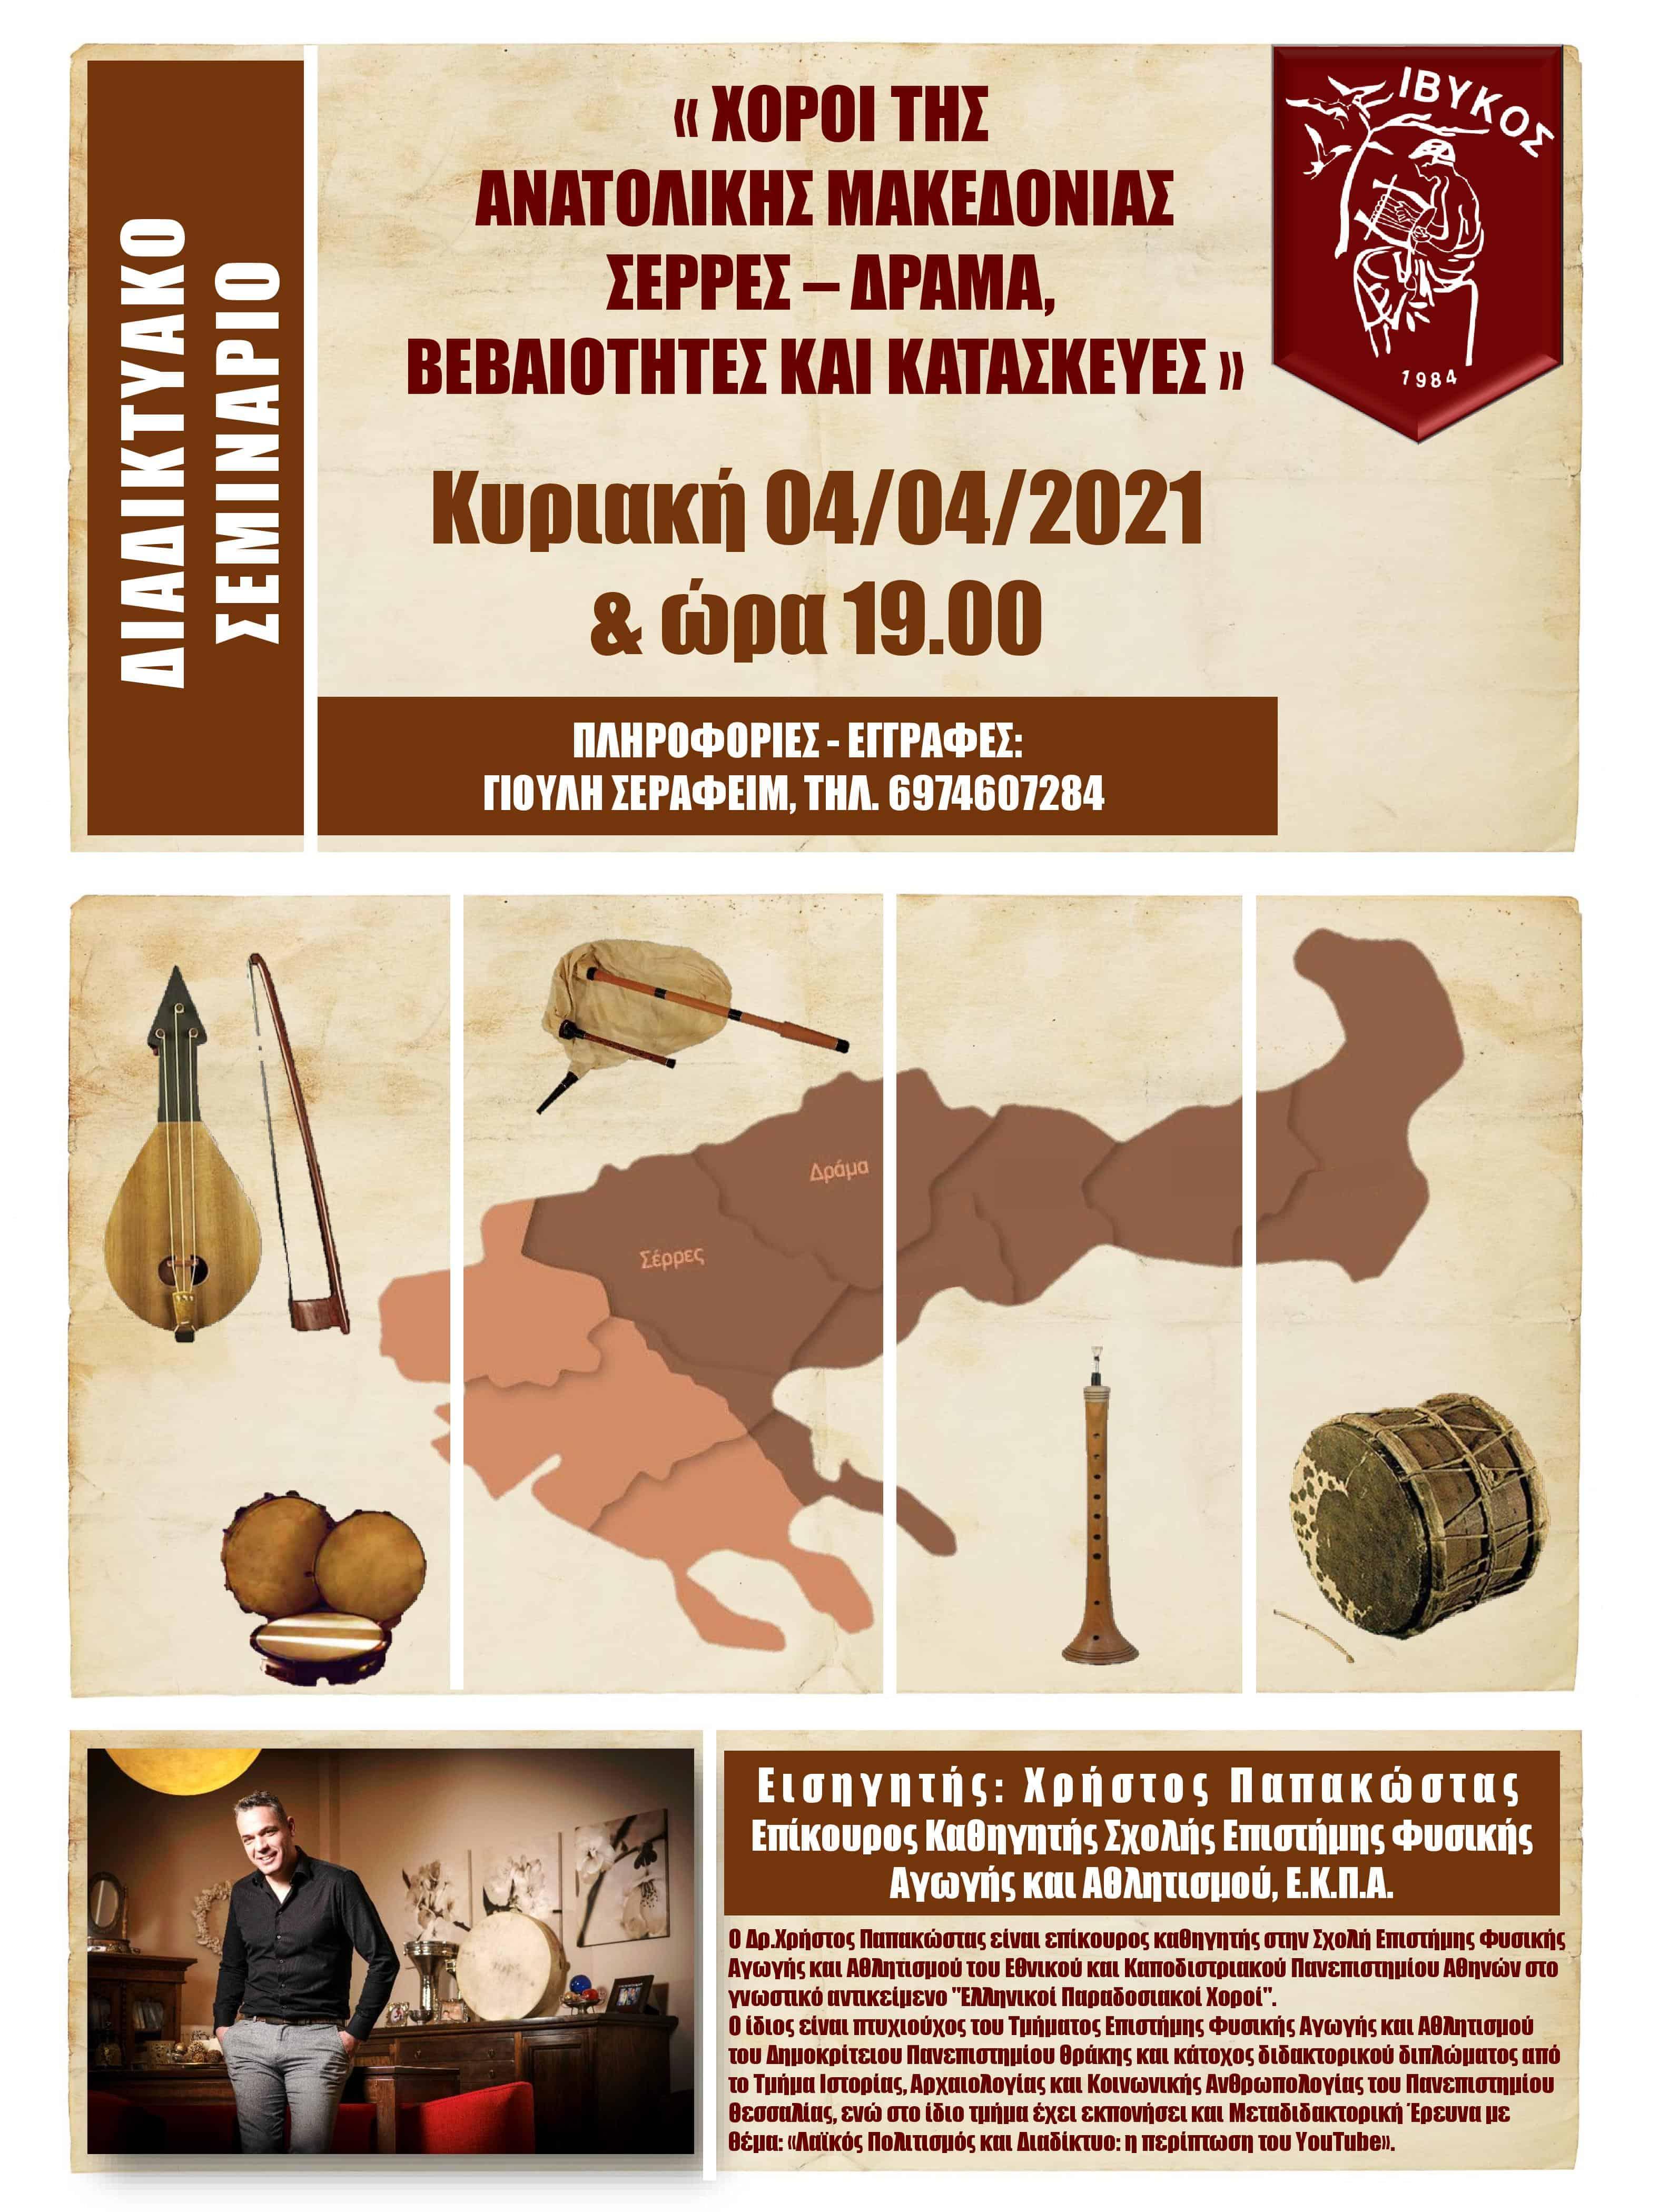 Ivykos - Anatoliki Makedonia Seminario